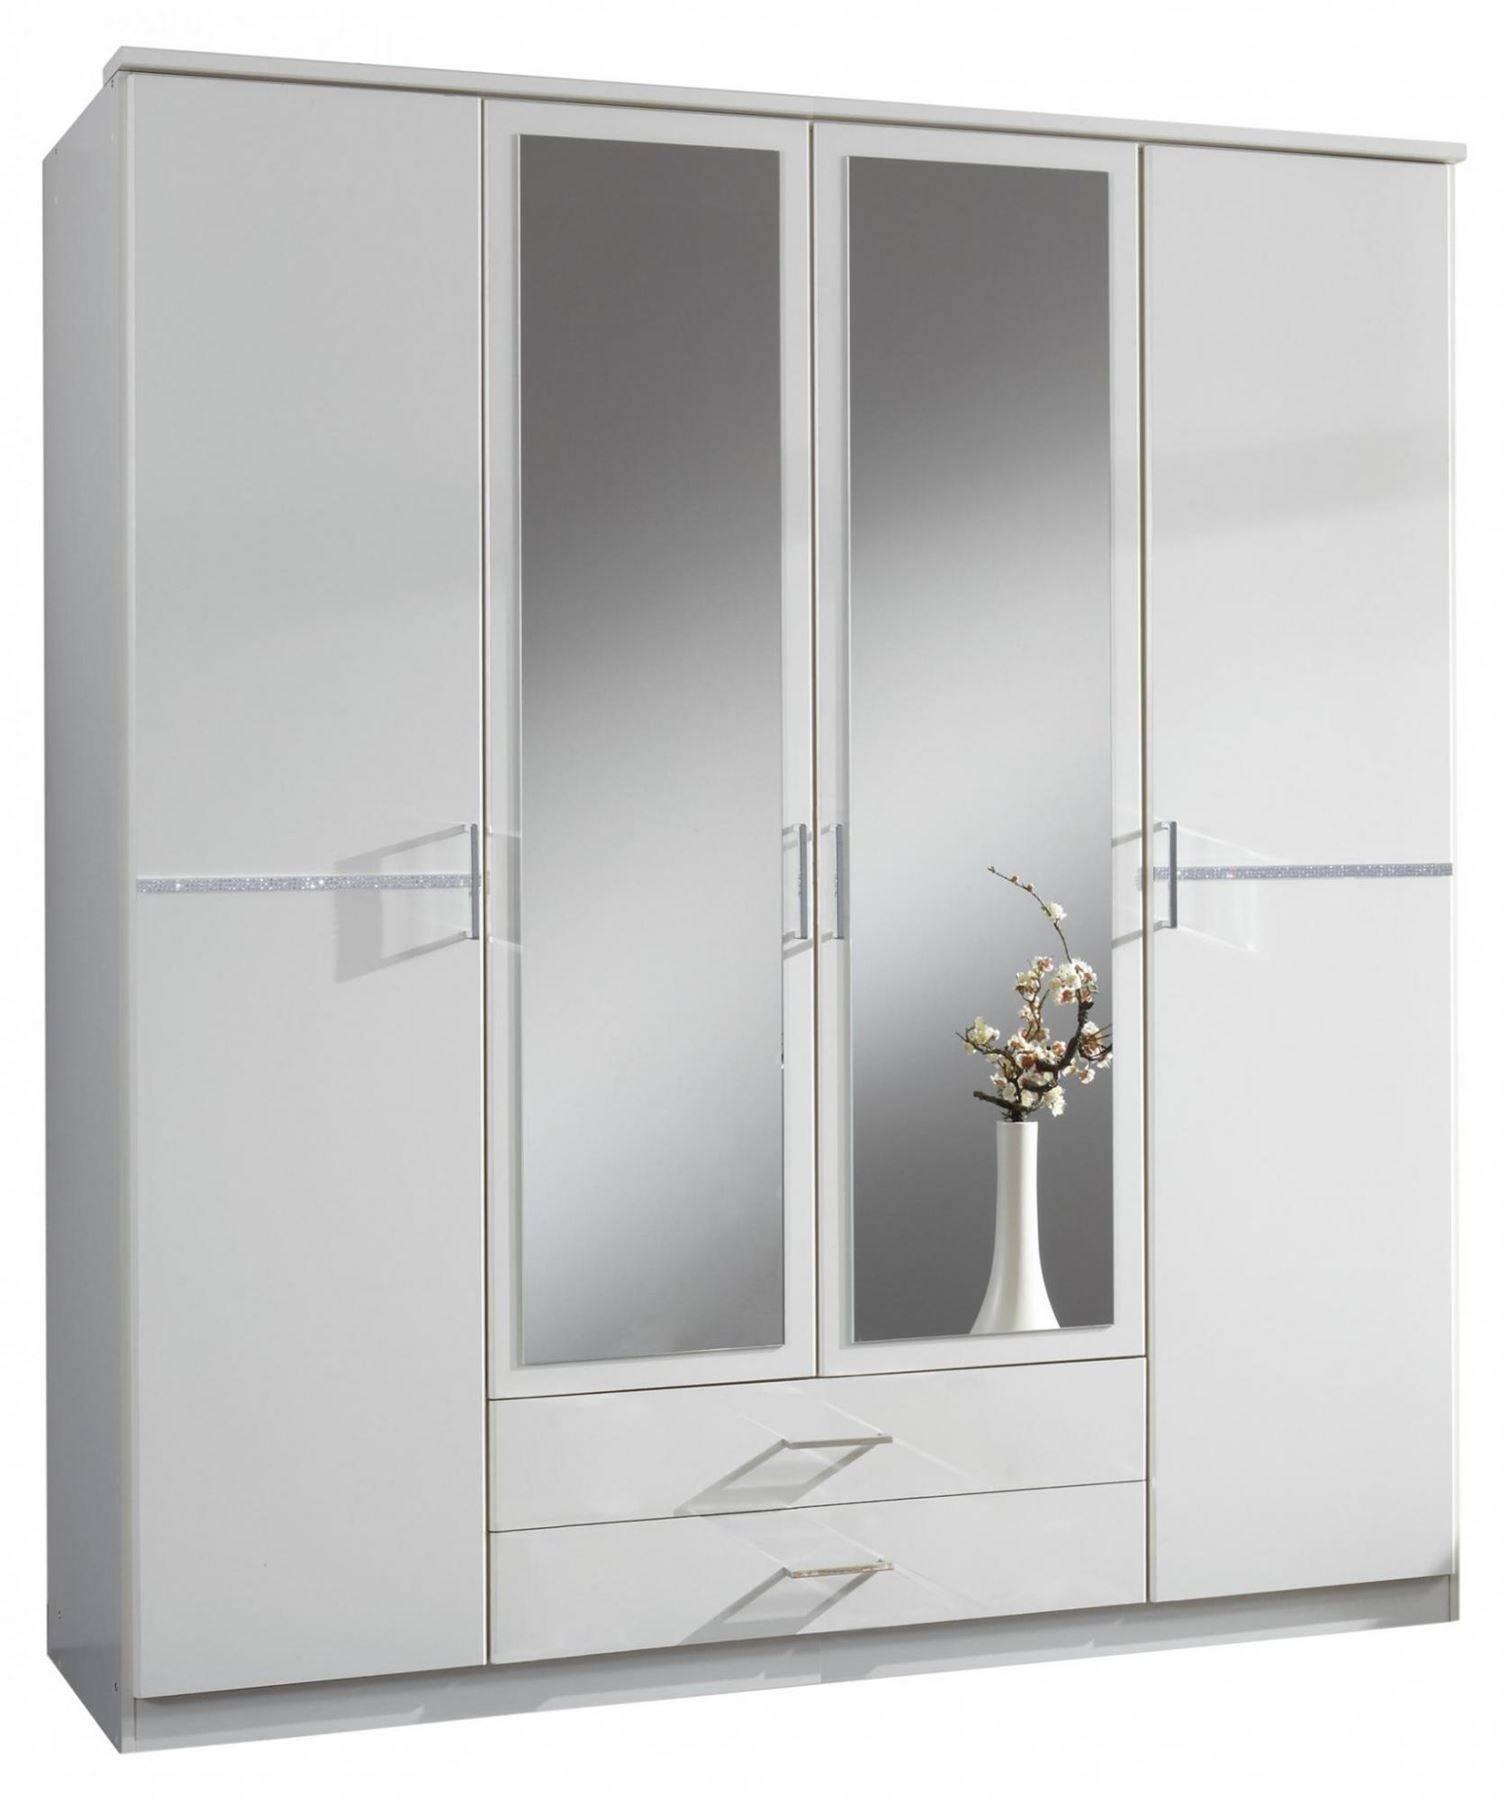 Bijoux German 4 Door Wardrobe White Crystal Rhinestone Bling within 4 Door Wardrobes With Mirror and Drawers (Image 4 of 15)